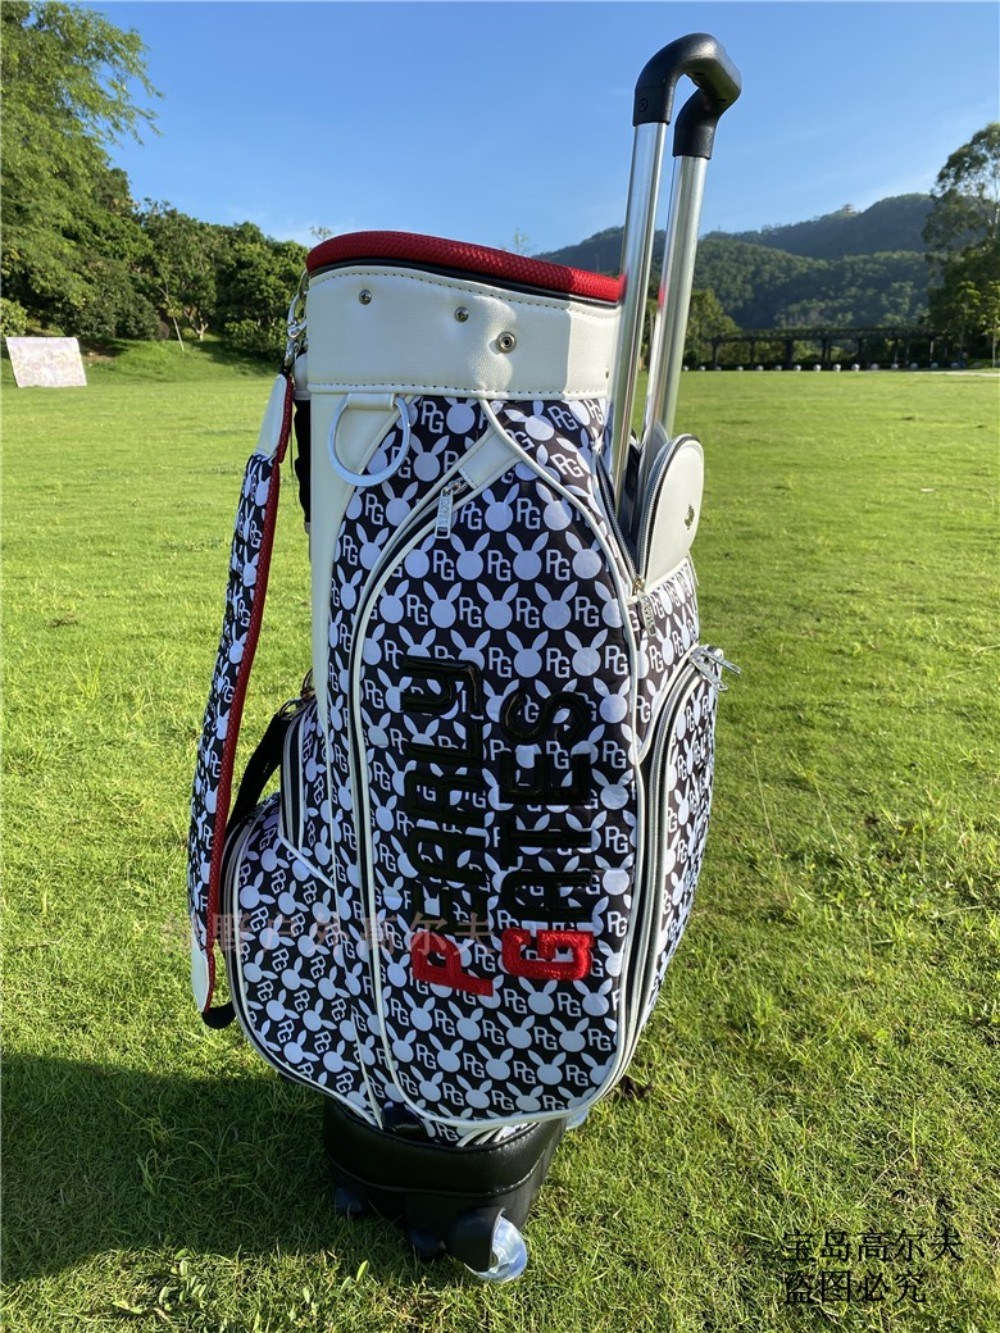 PEARLYGATES 파리게이츠 골프백 바퀴형 남녀공용 이동가방 캐디백, 검정